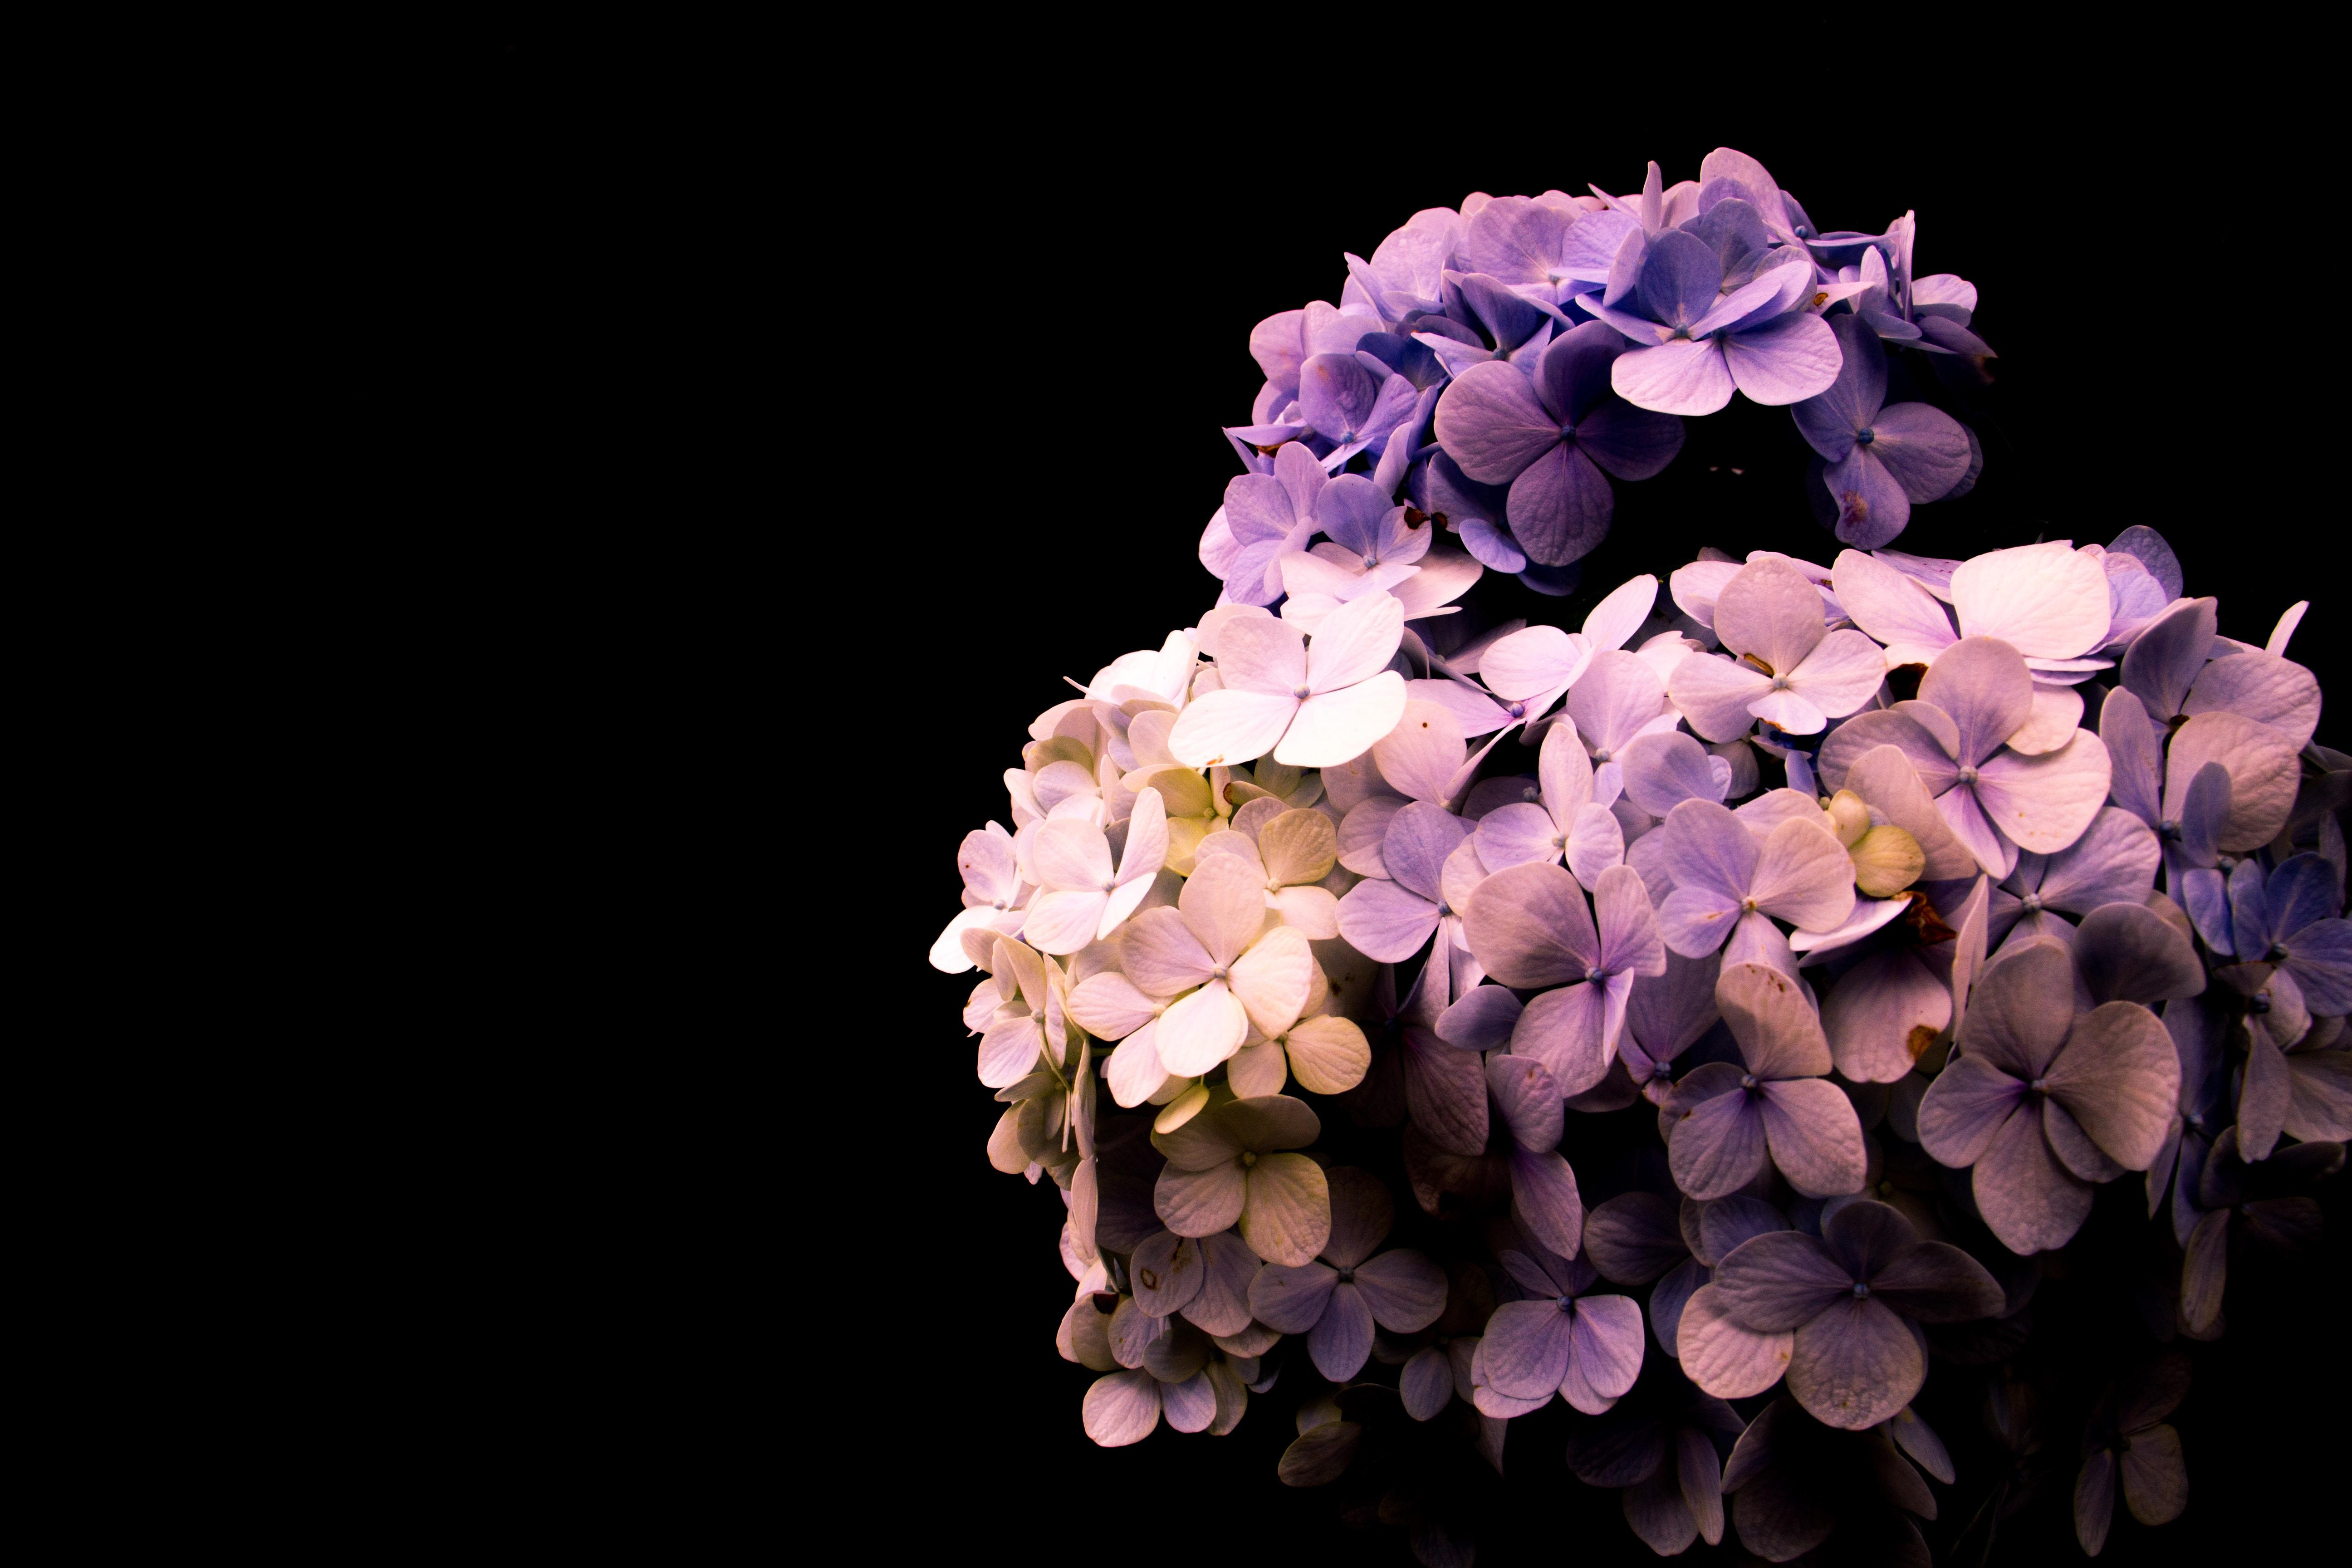 purple and pink flower buoquet